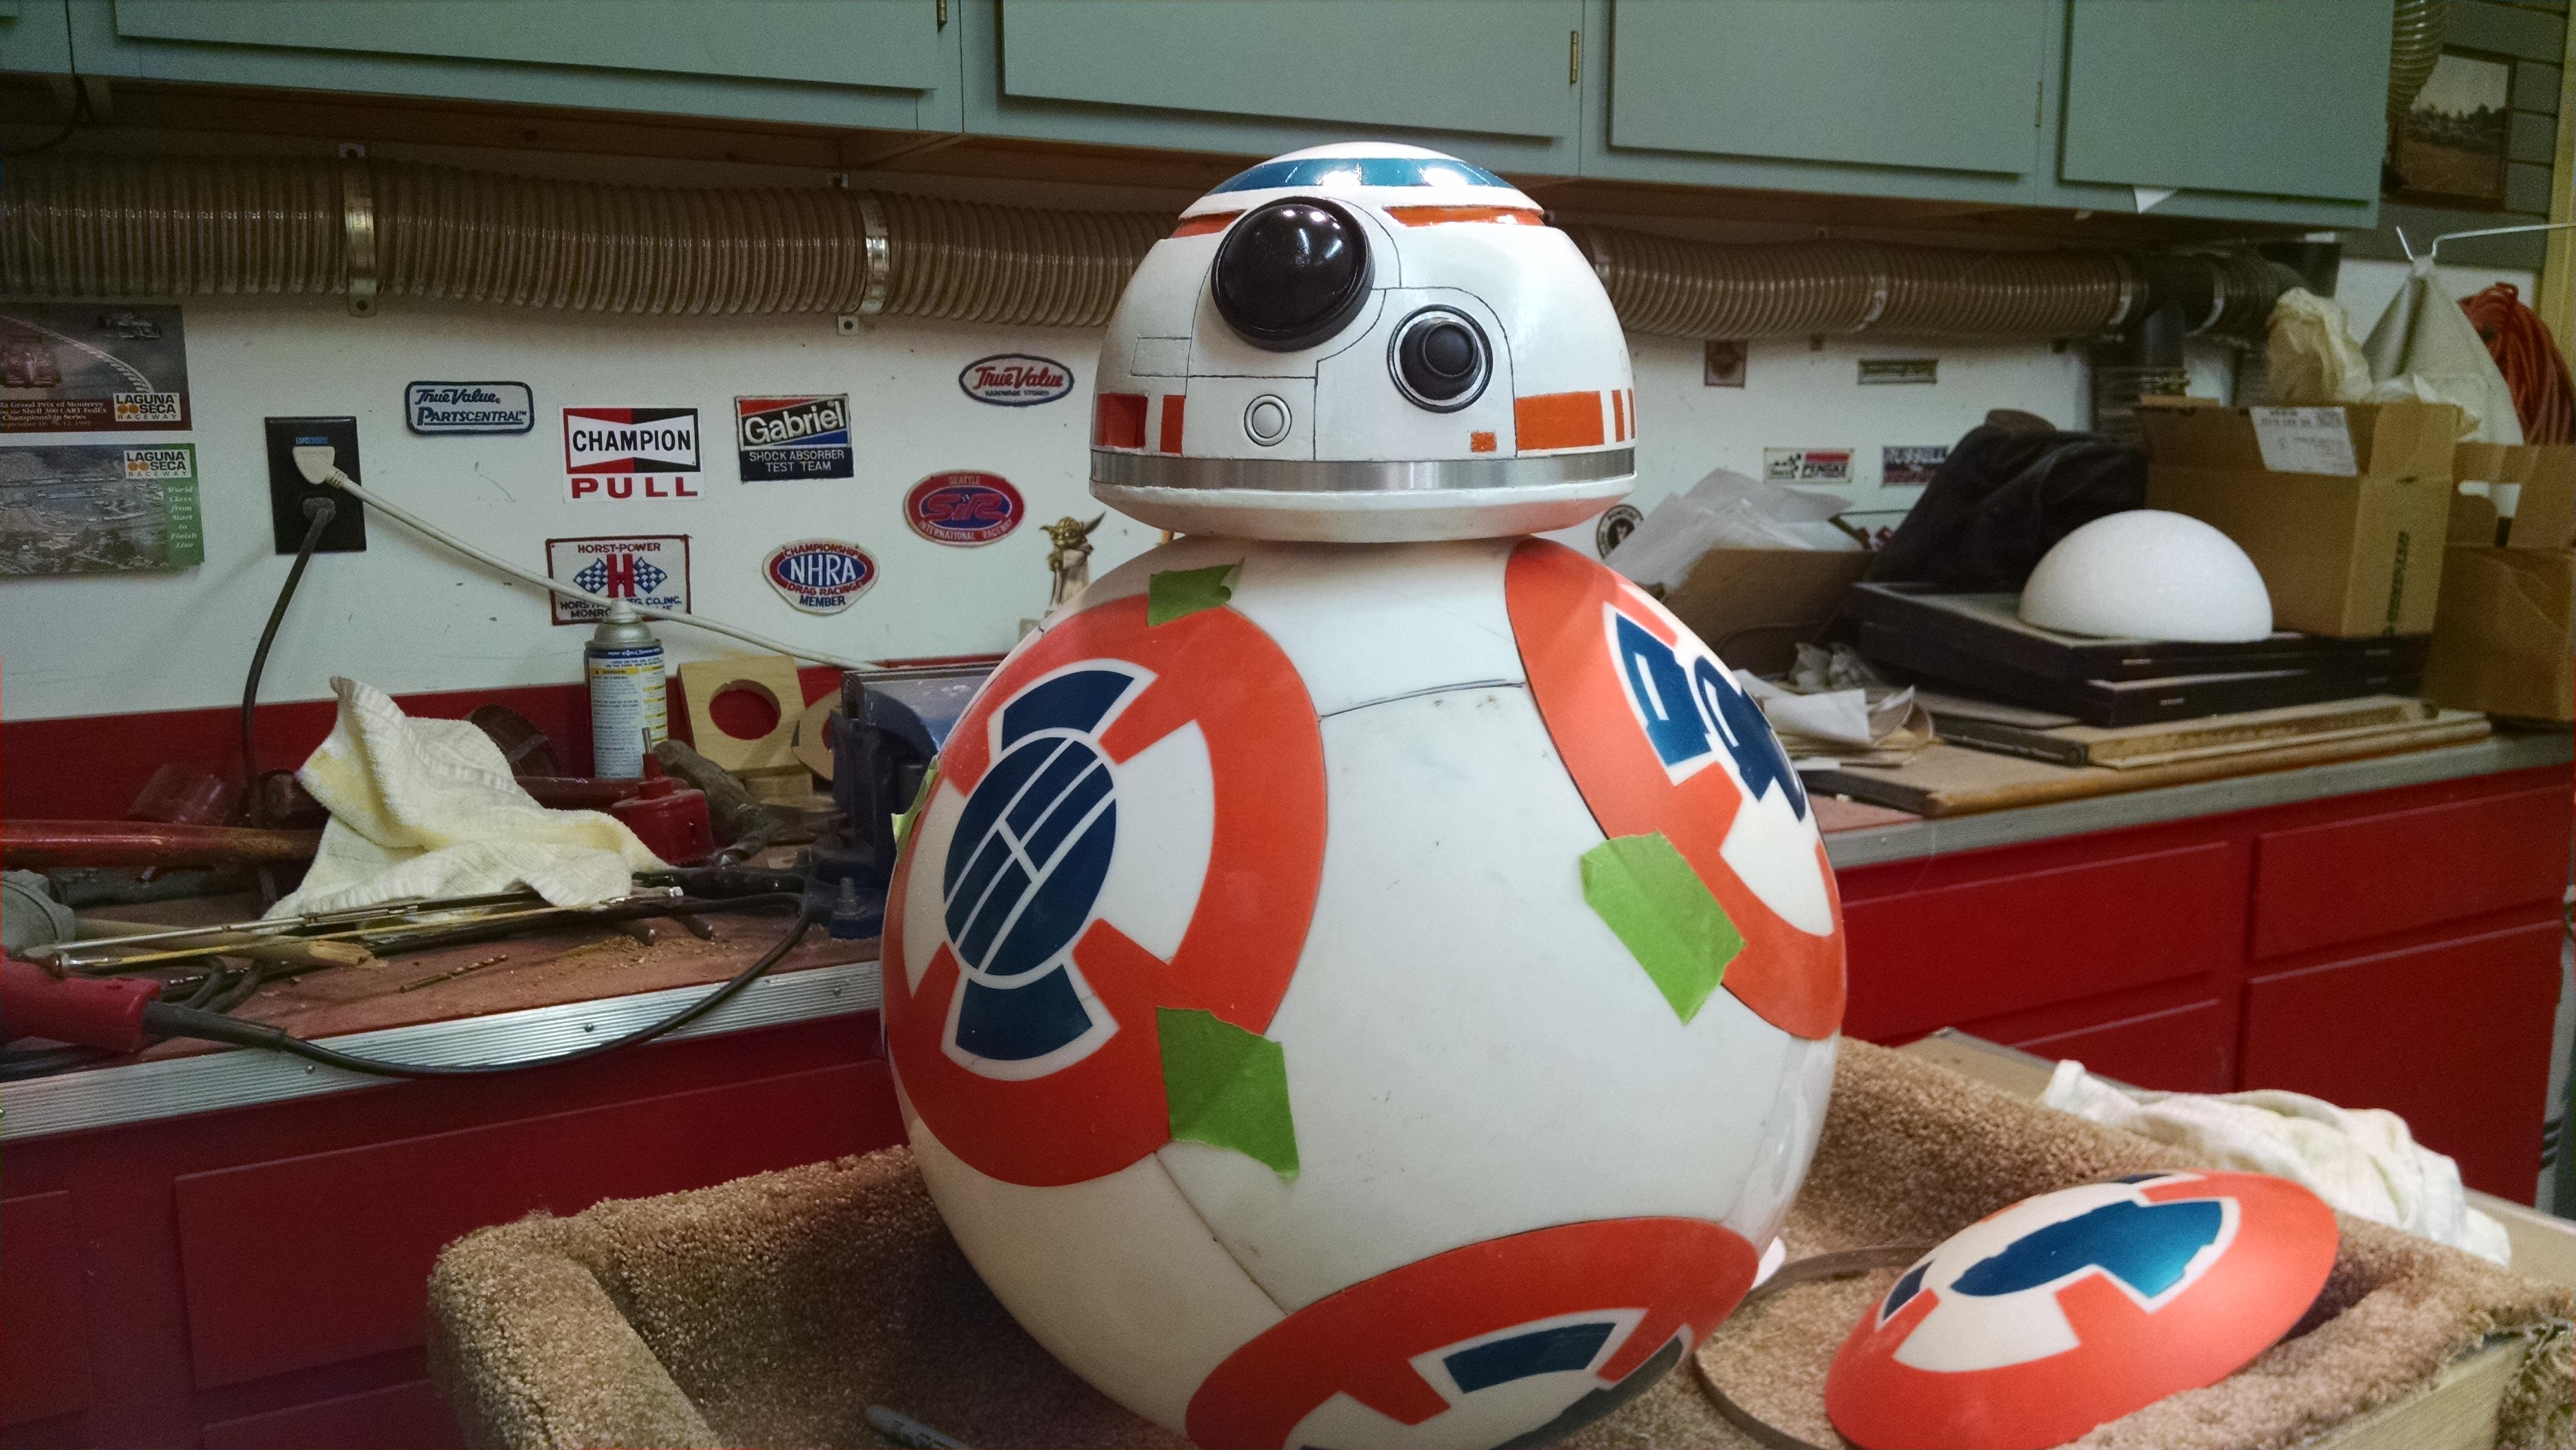 DIY Star Wars BB-8 Robot Built Using Power Wheels